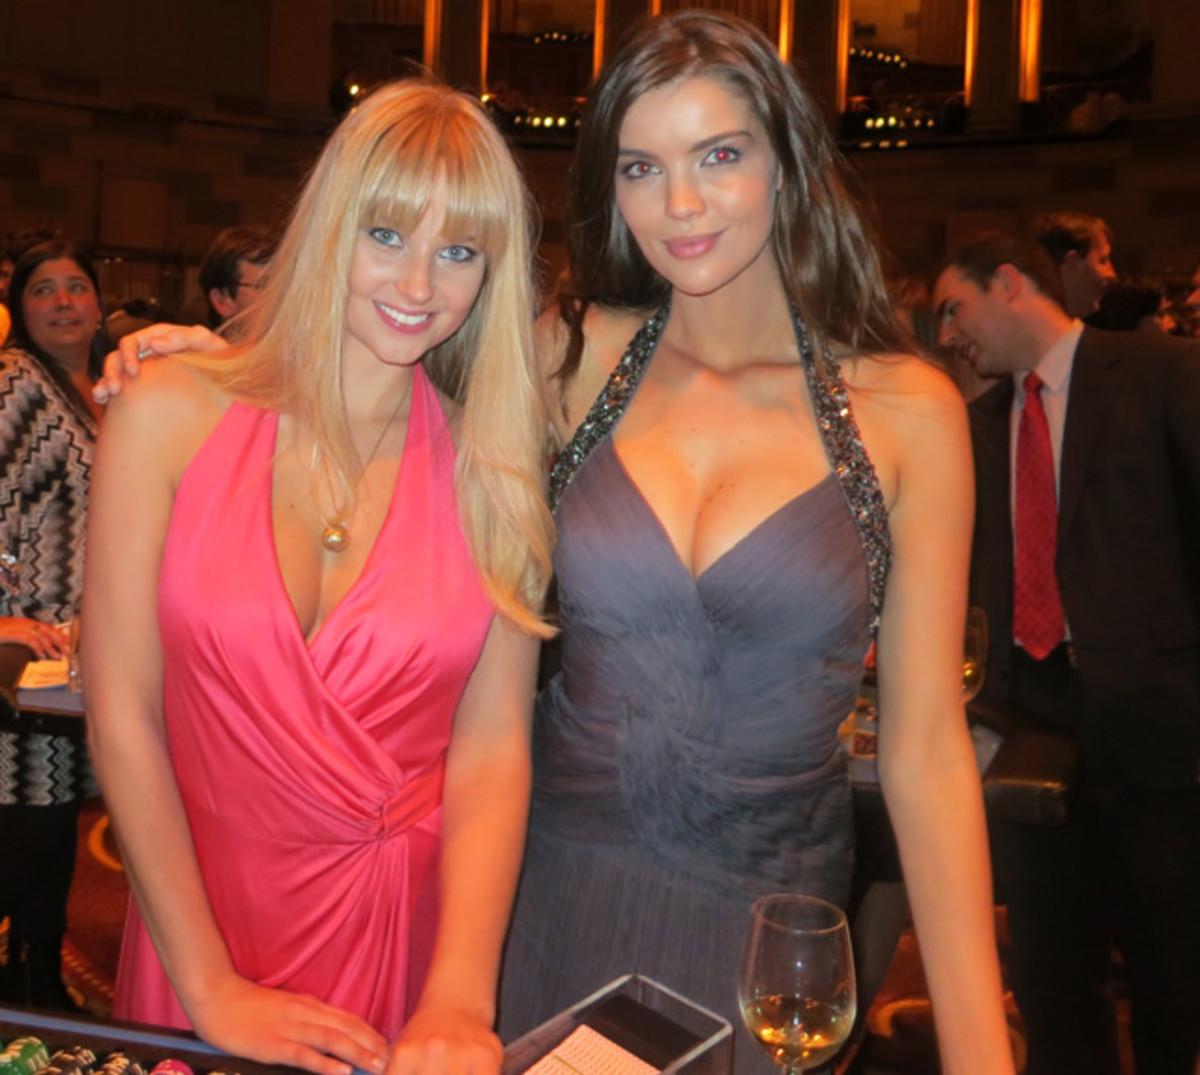 Genevieve Morton and Natasha Barnard